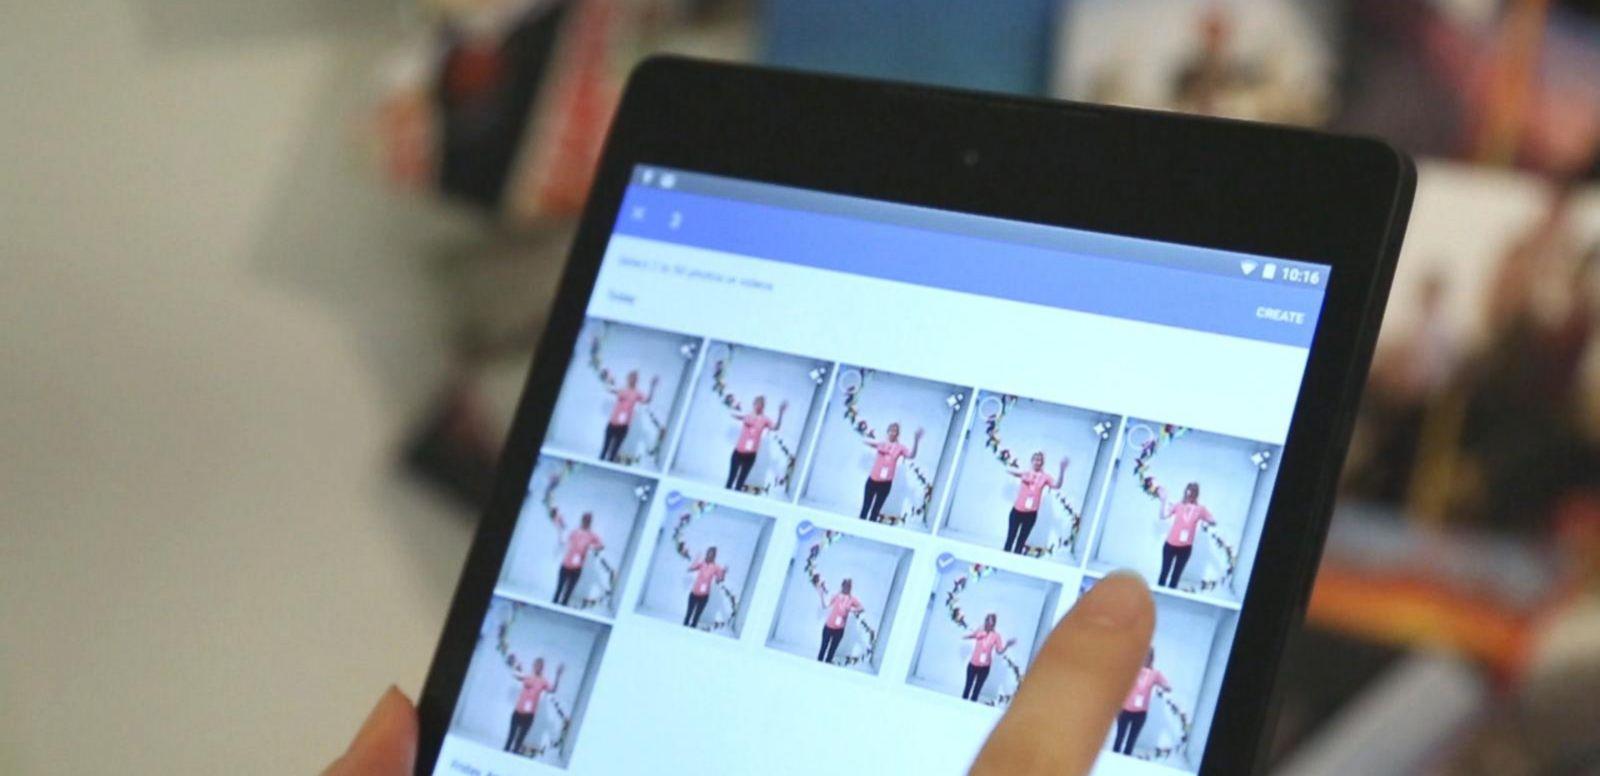 VIDEO: How To Make a GIF Using Google Photos